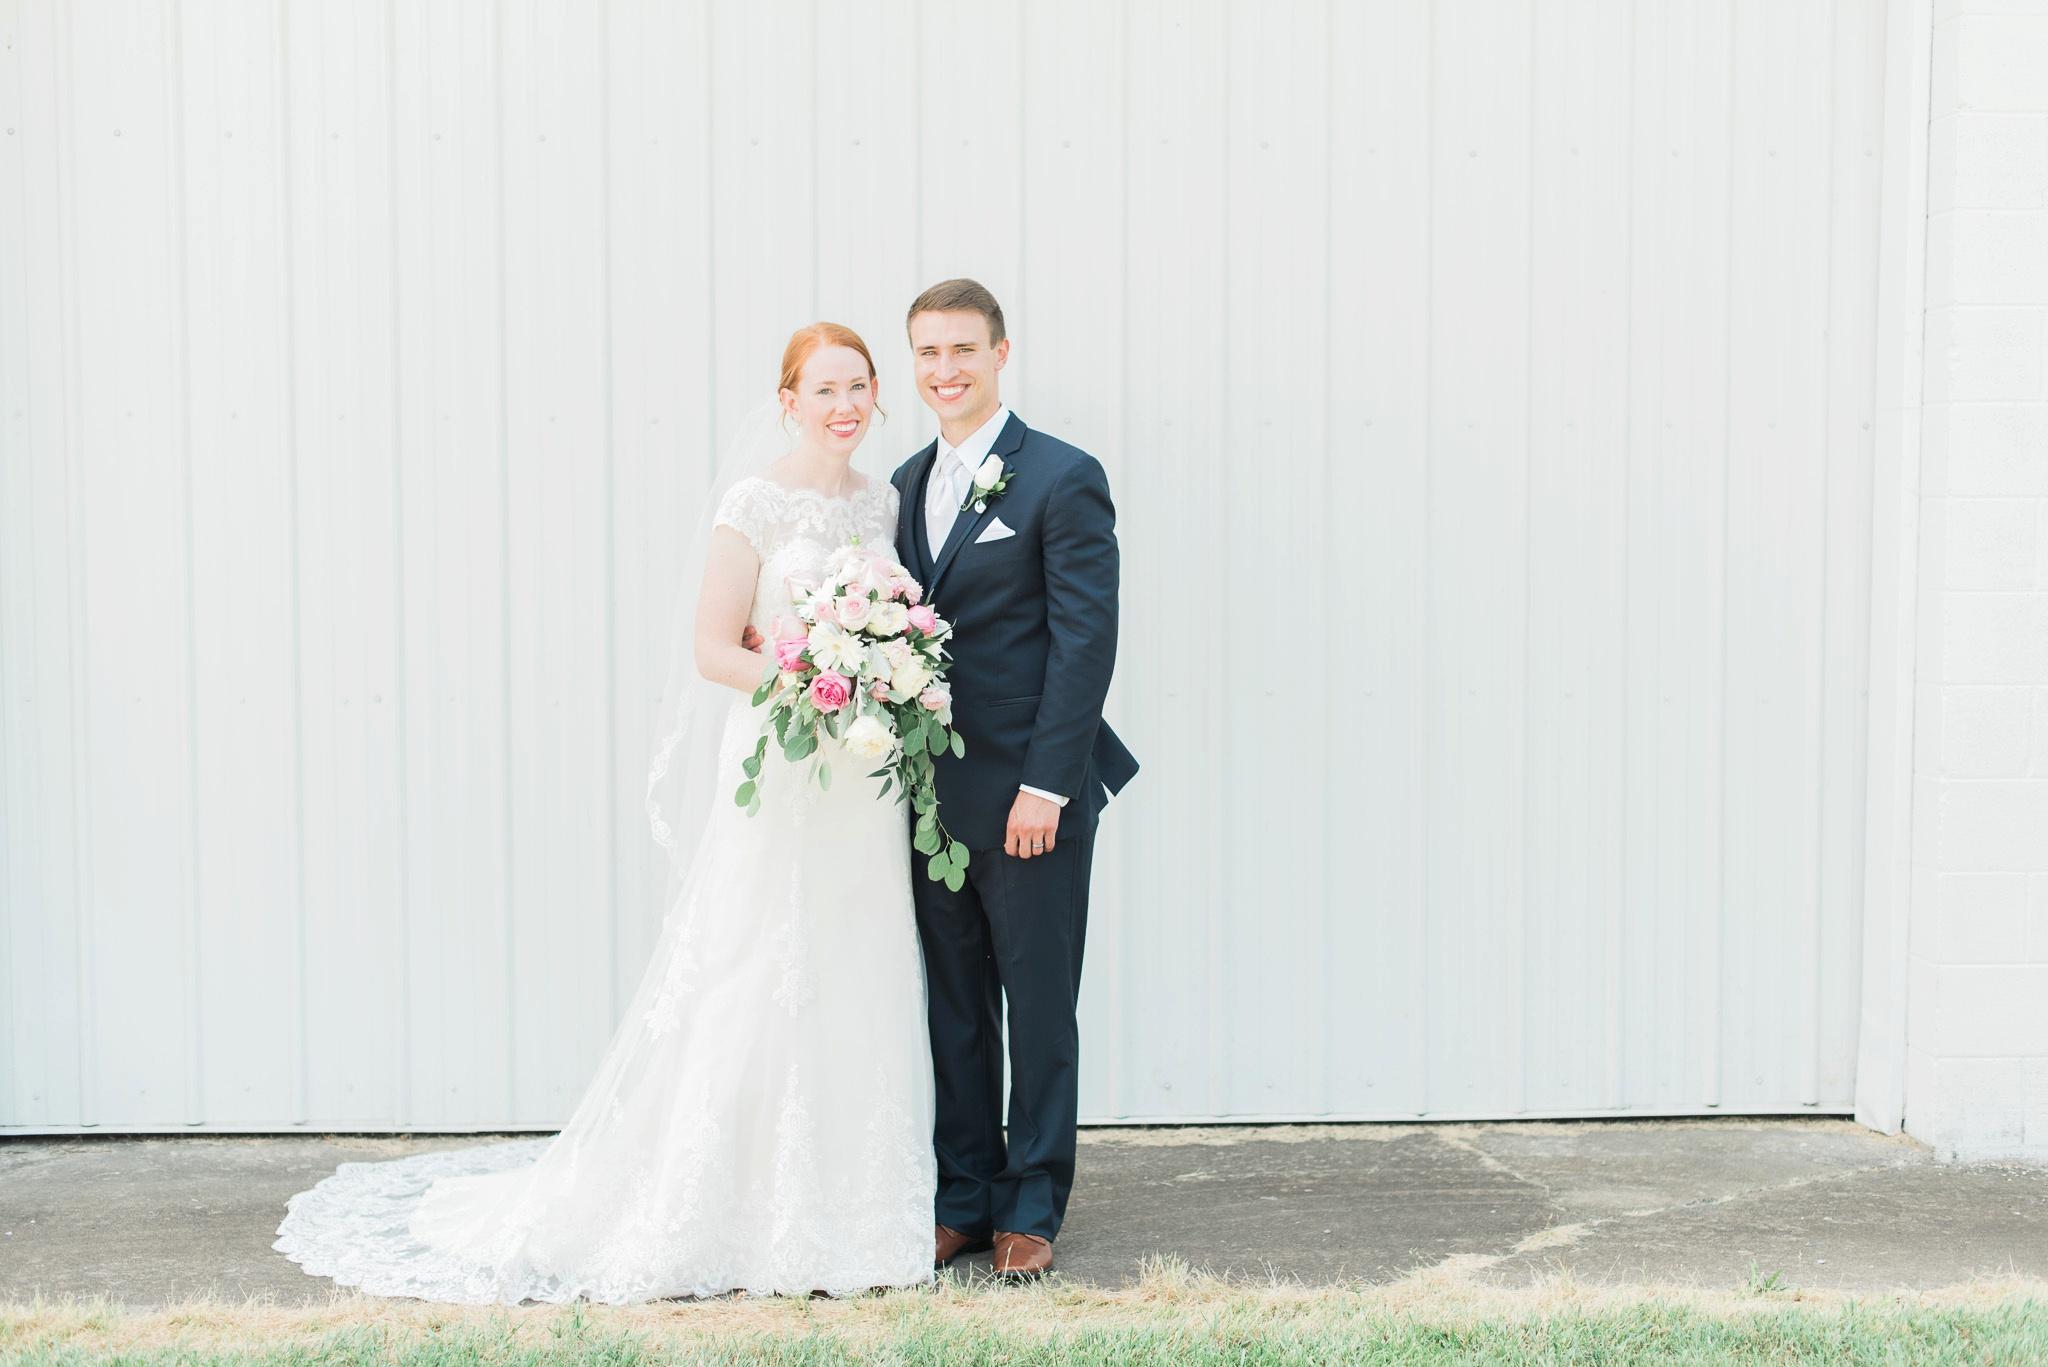 sunbury-ohio-wedding-hannah-johnathan_0074.jpg